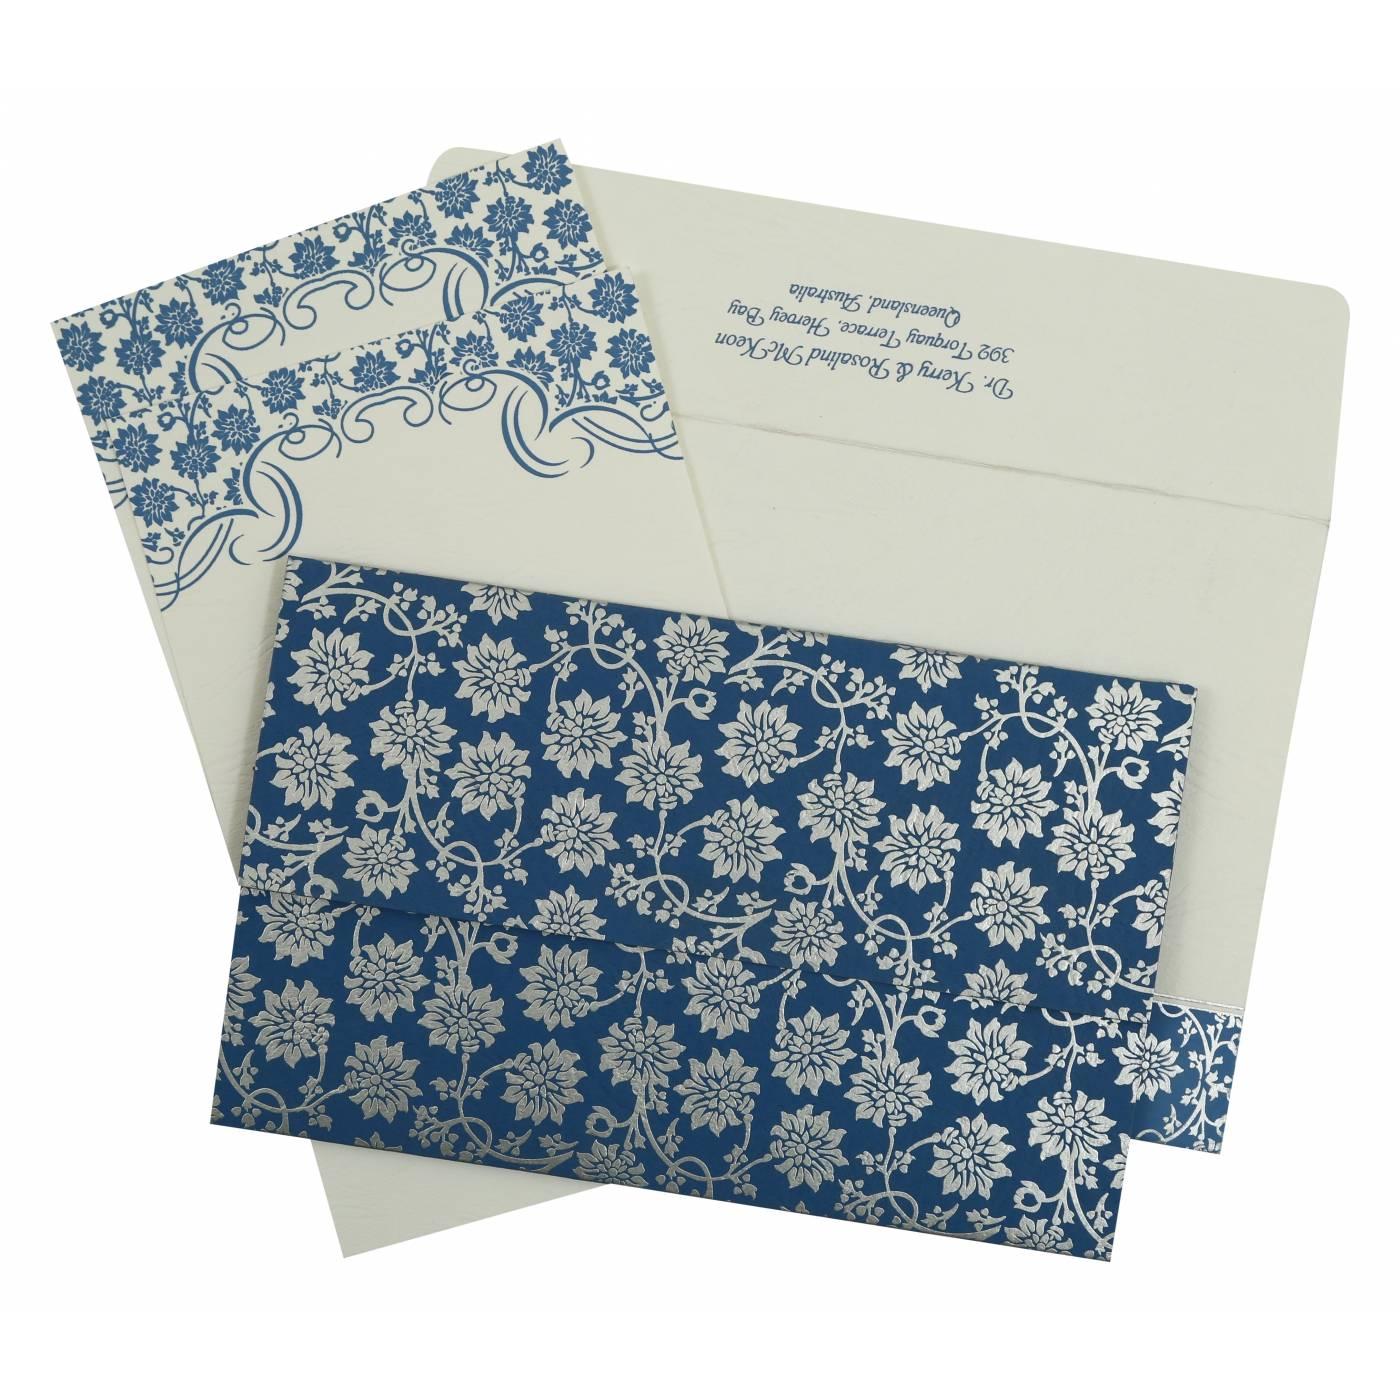 BLUE MATTE FLORAL THEMED - SCREEN PRINTED WEDDING INVITATION : CRU-810A - IndianWeddingCards